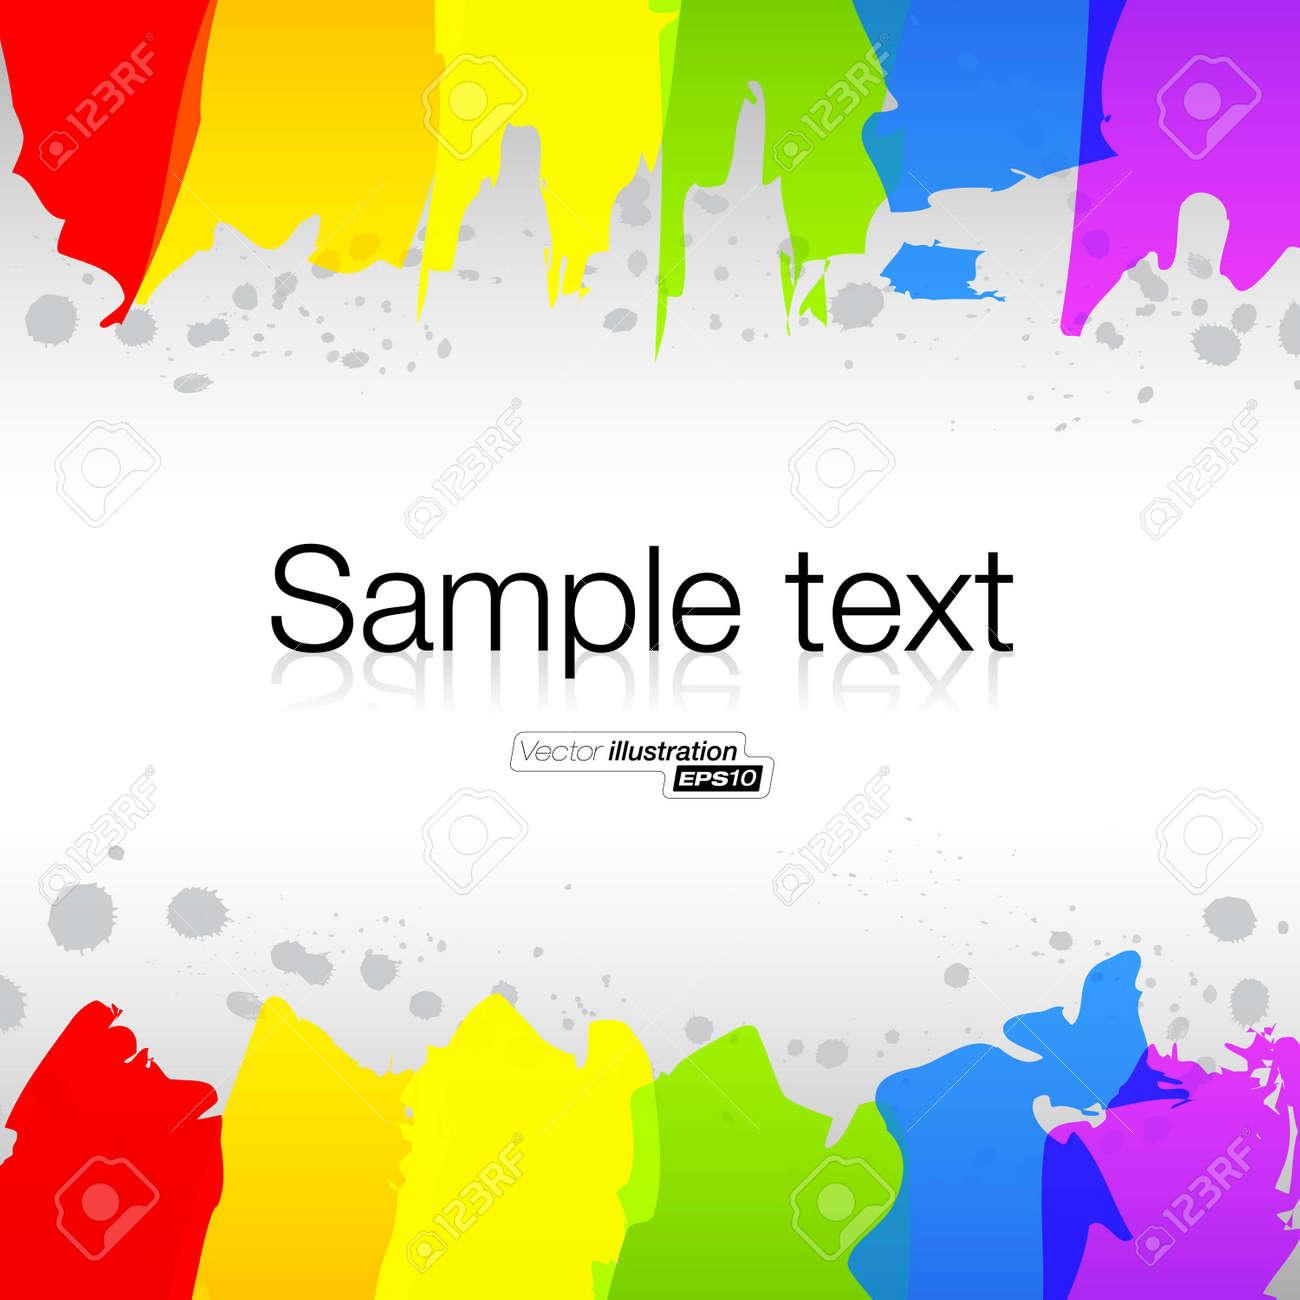 Abstaract hand drawn watercolor rainbow lines - 14515898